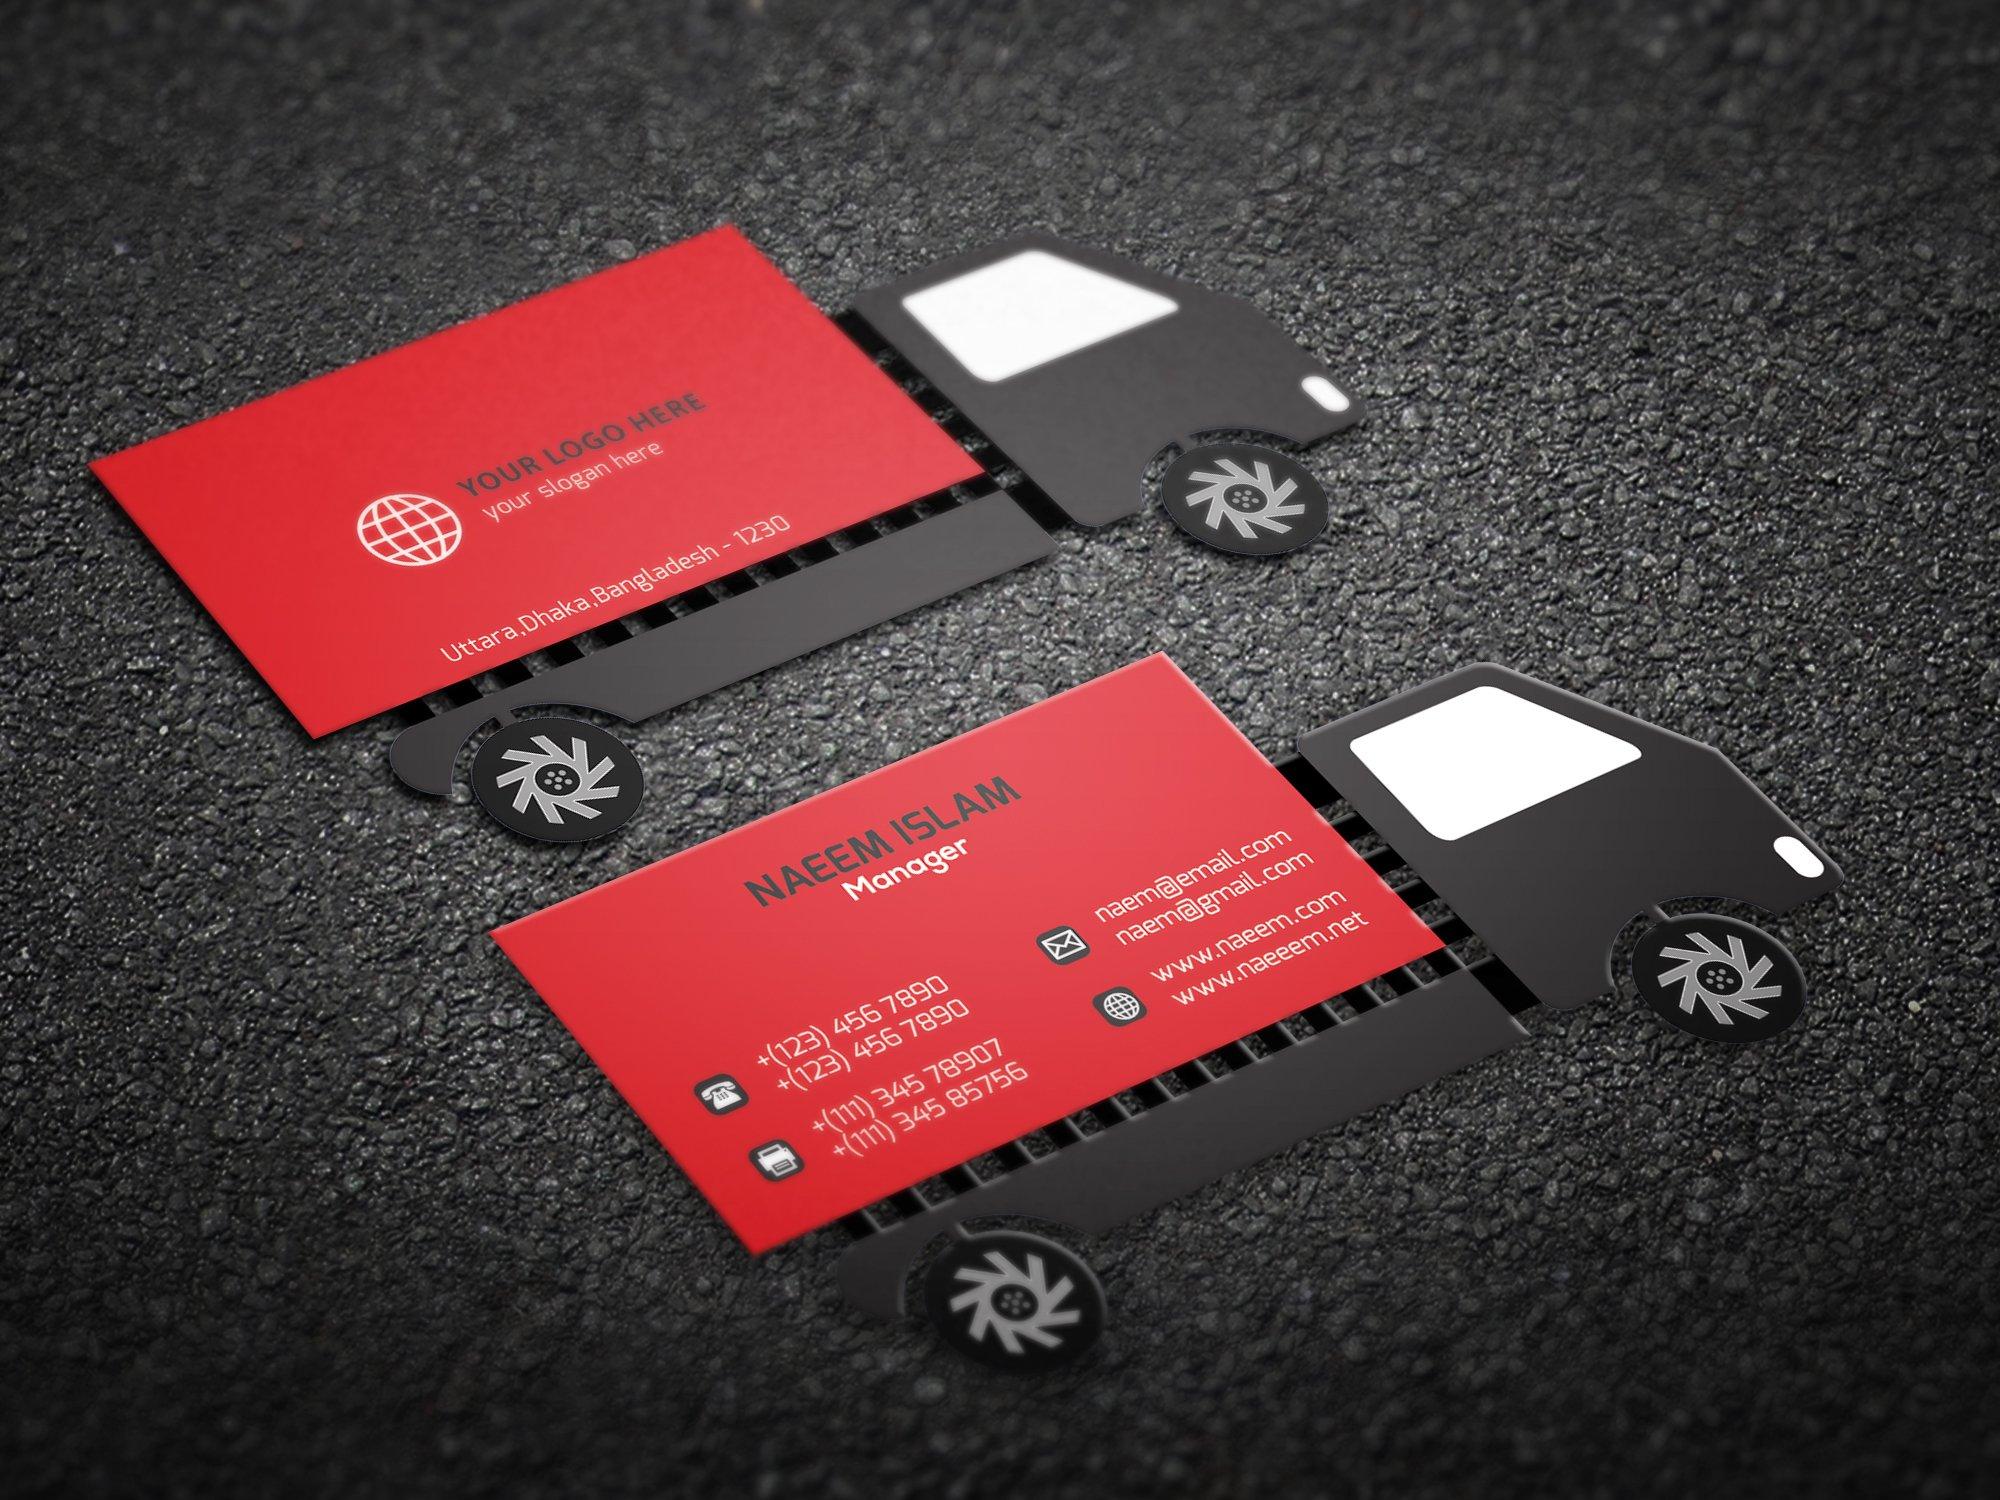 23 tarjetas de presentaci n que impactar n a tus clientes for Disenos para tarjetas